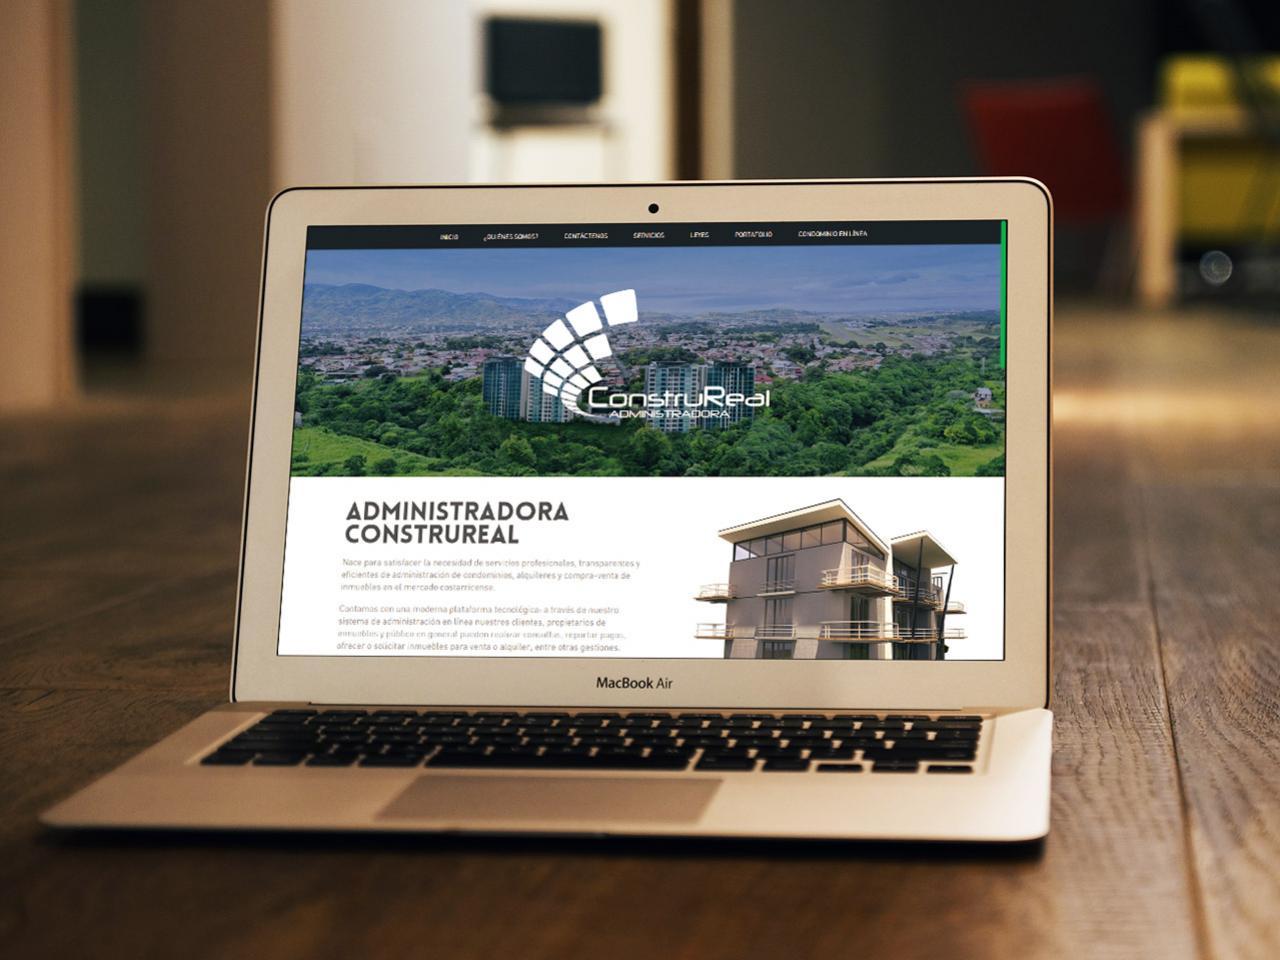 CONSTRUREAL ADMINISTRATOR, COSTA RICA